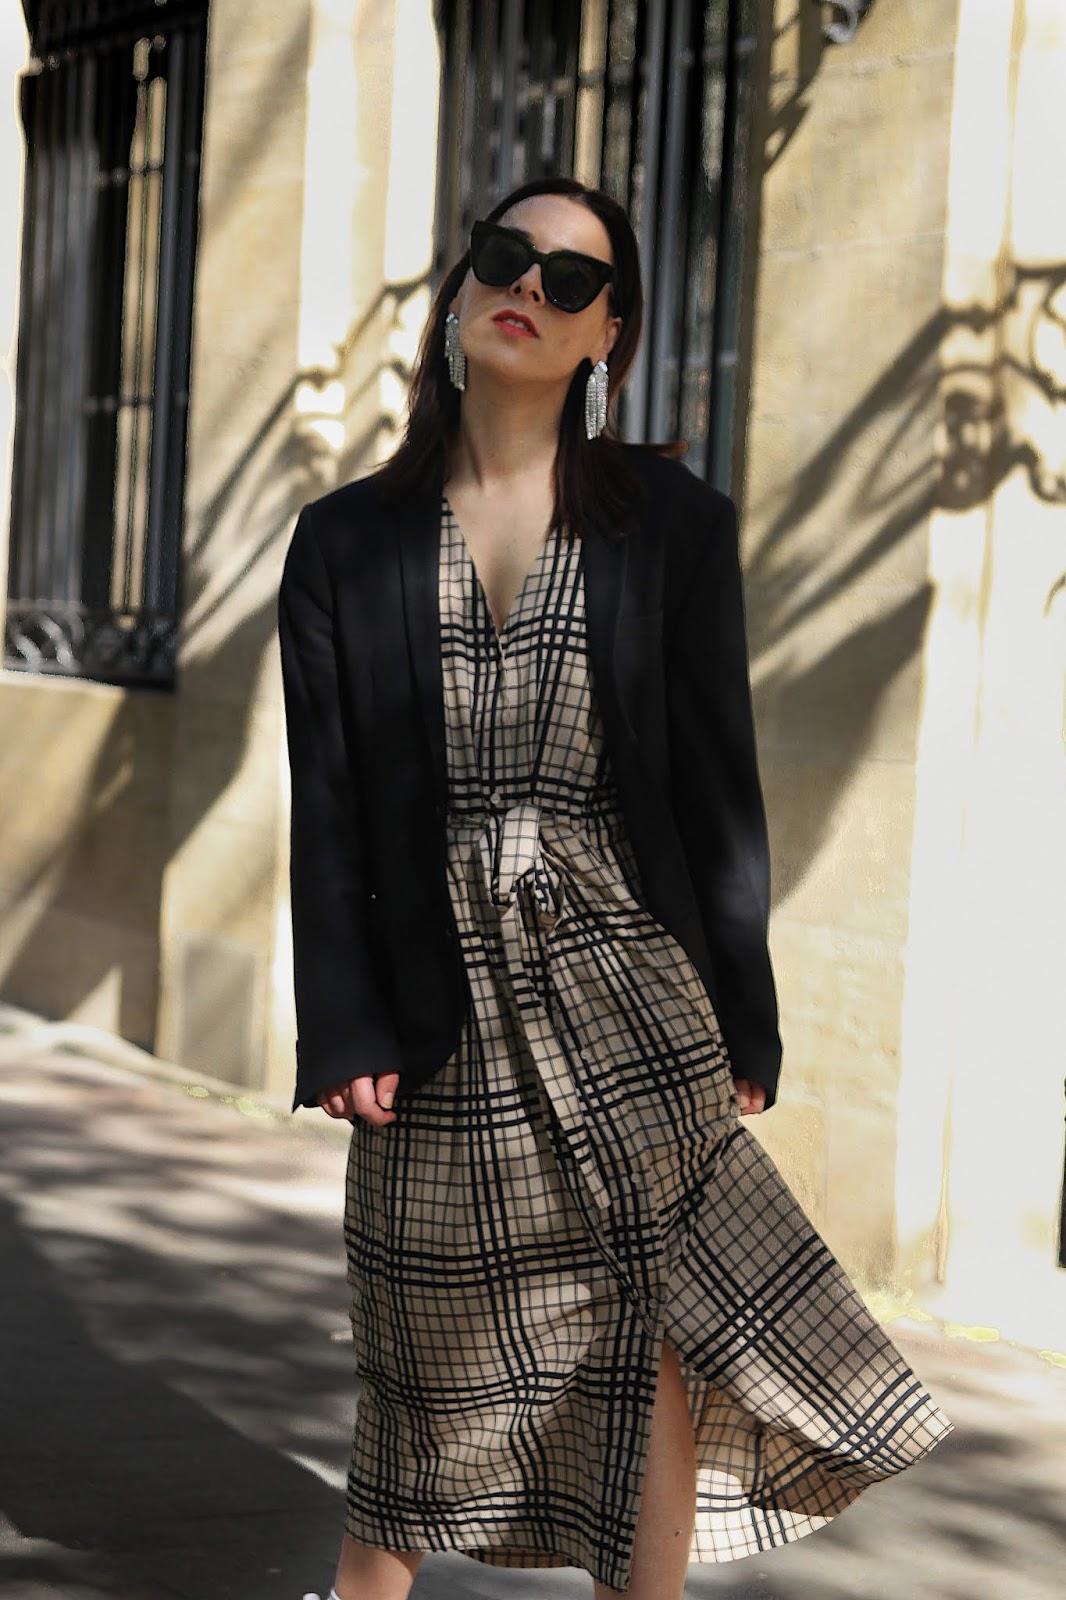 porter une robe avec des falcon tendance printemps 2019